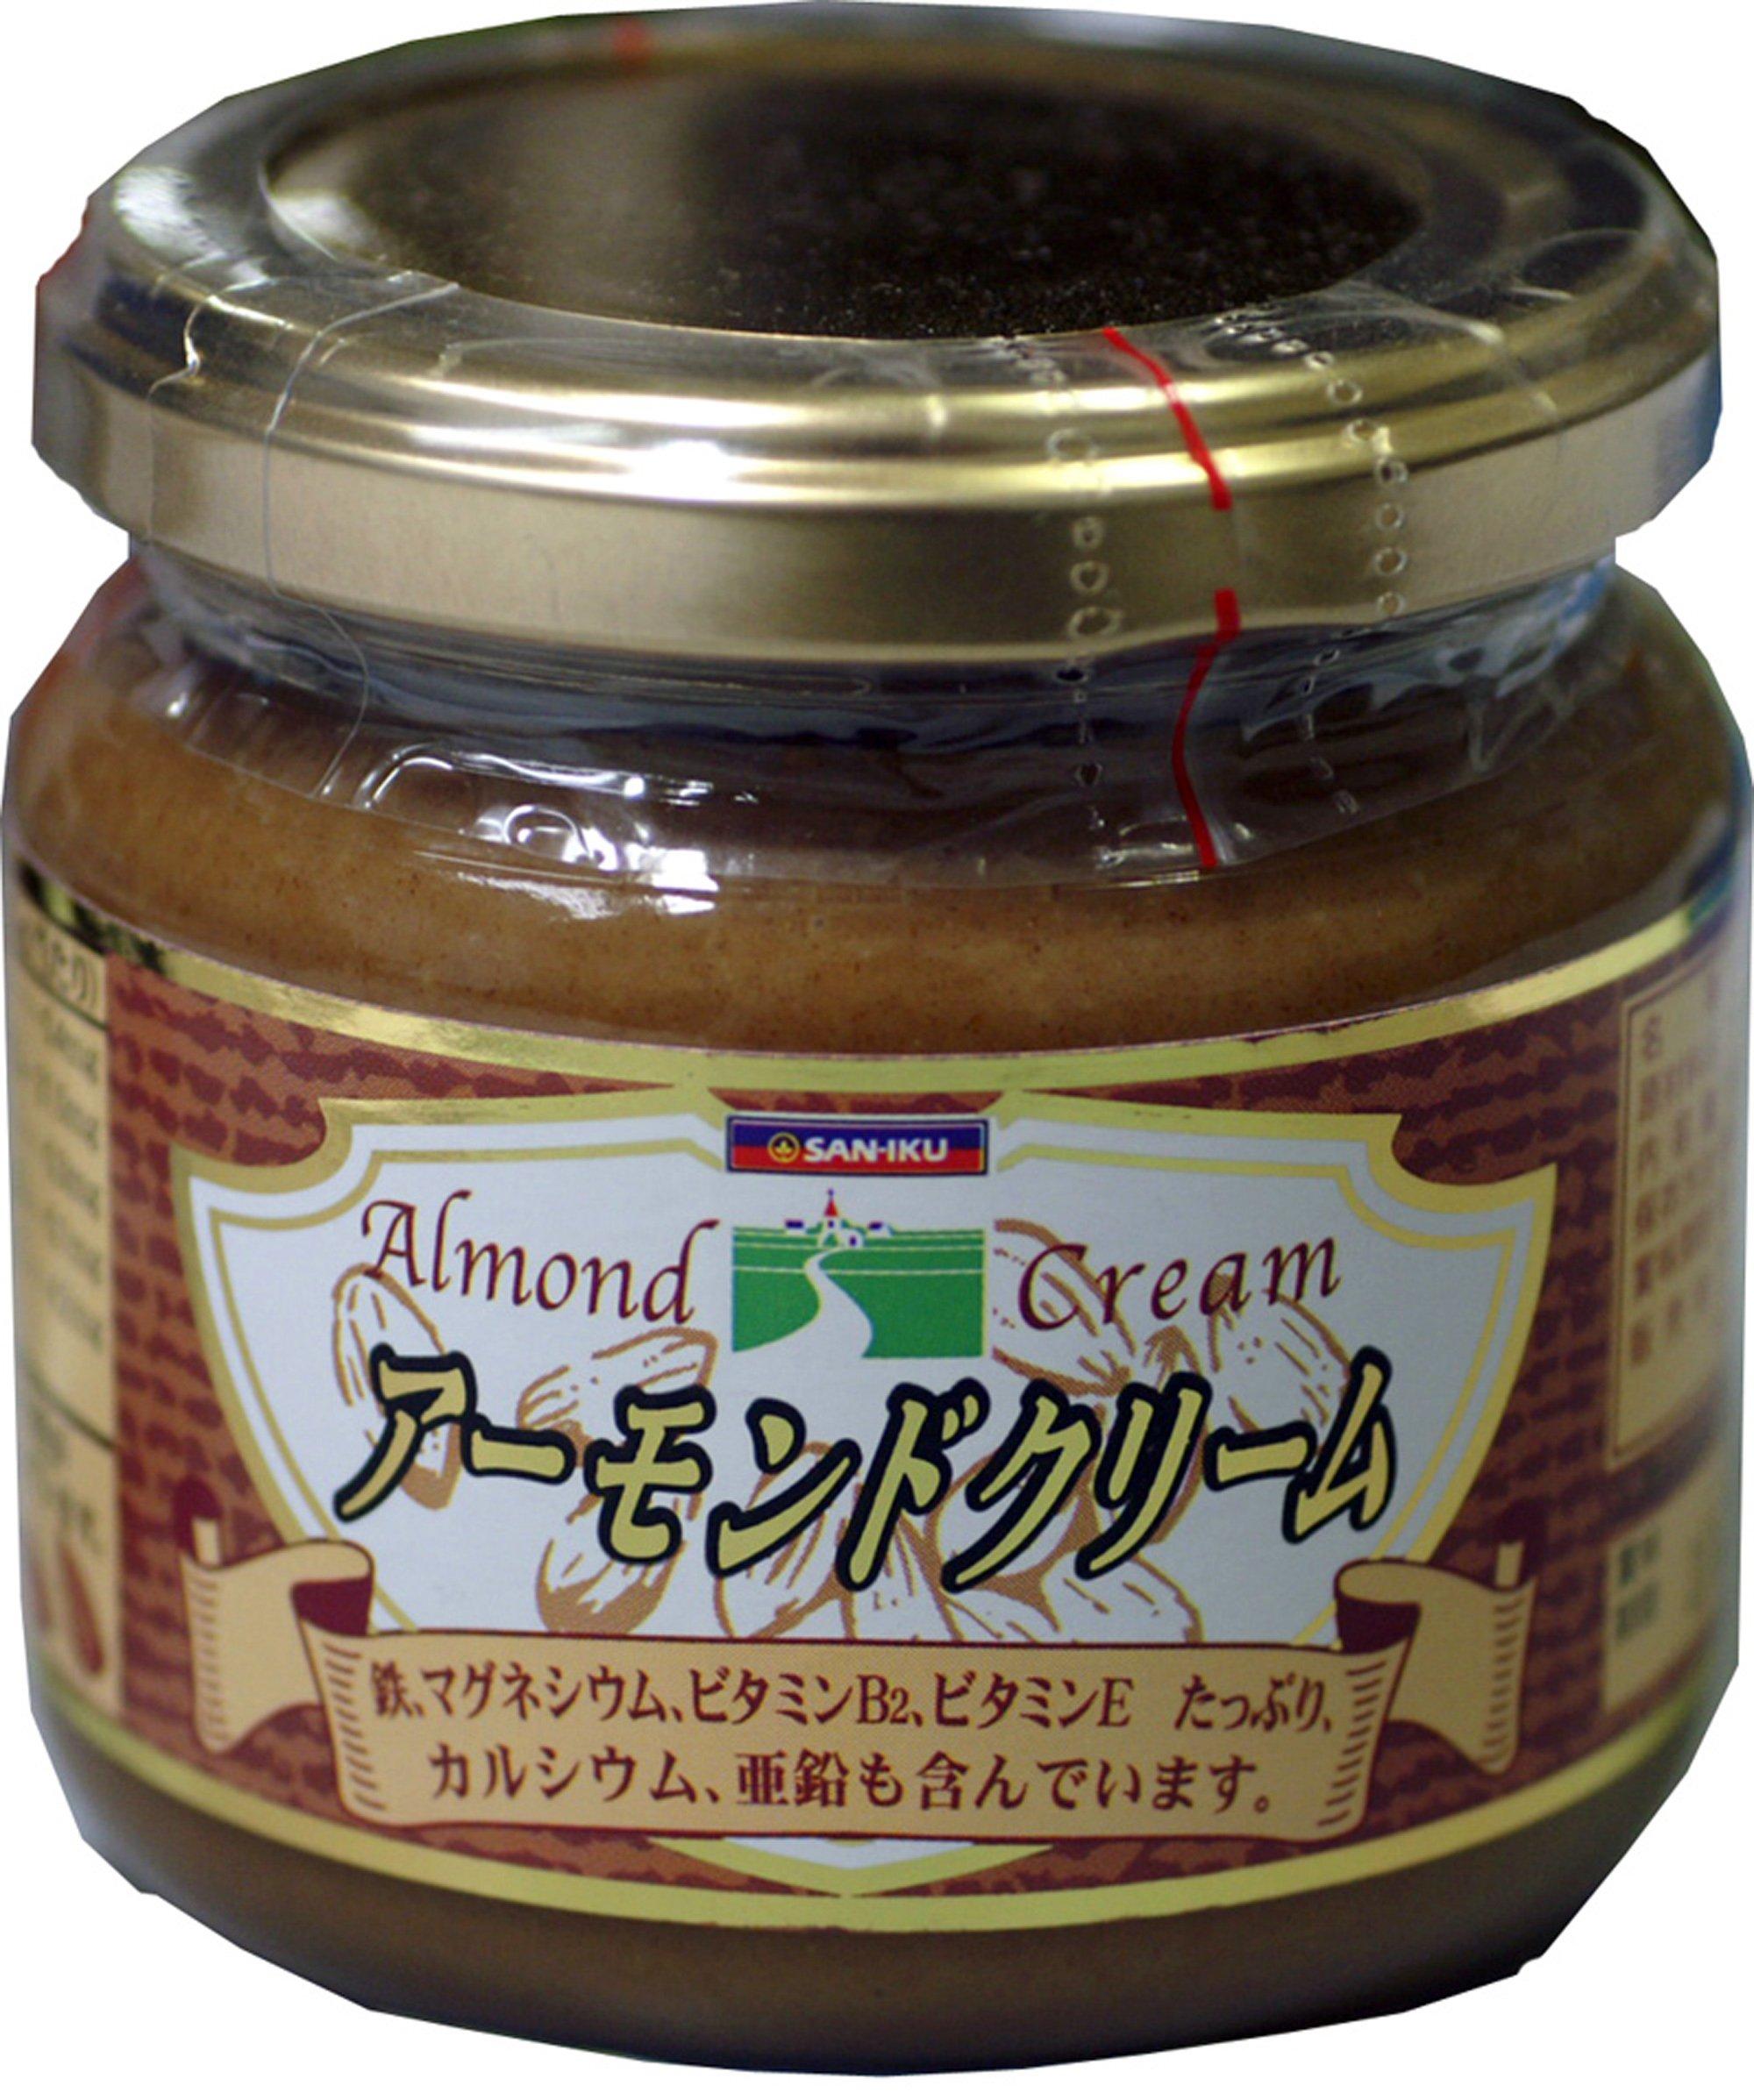 SanIku Foods almond cream 150g by SANIKU FOODS